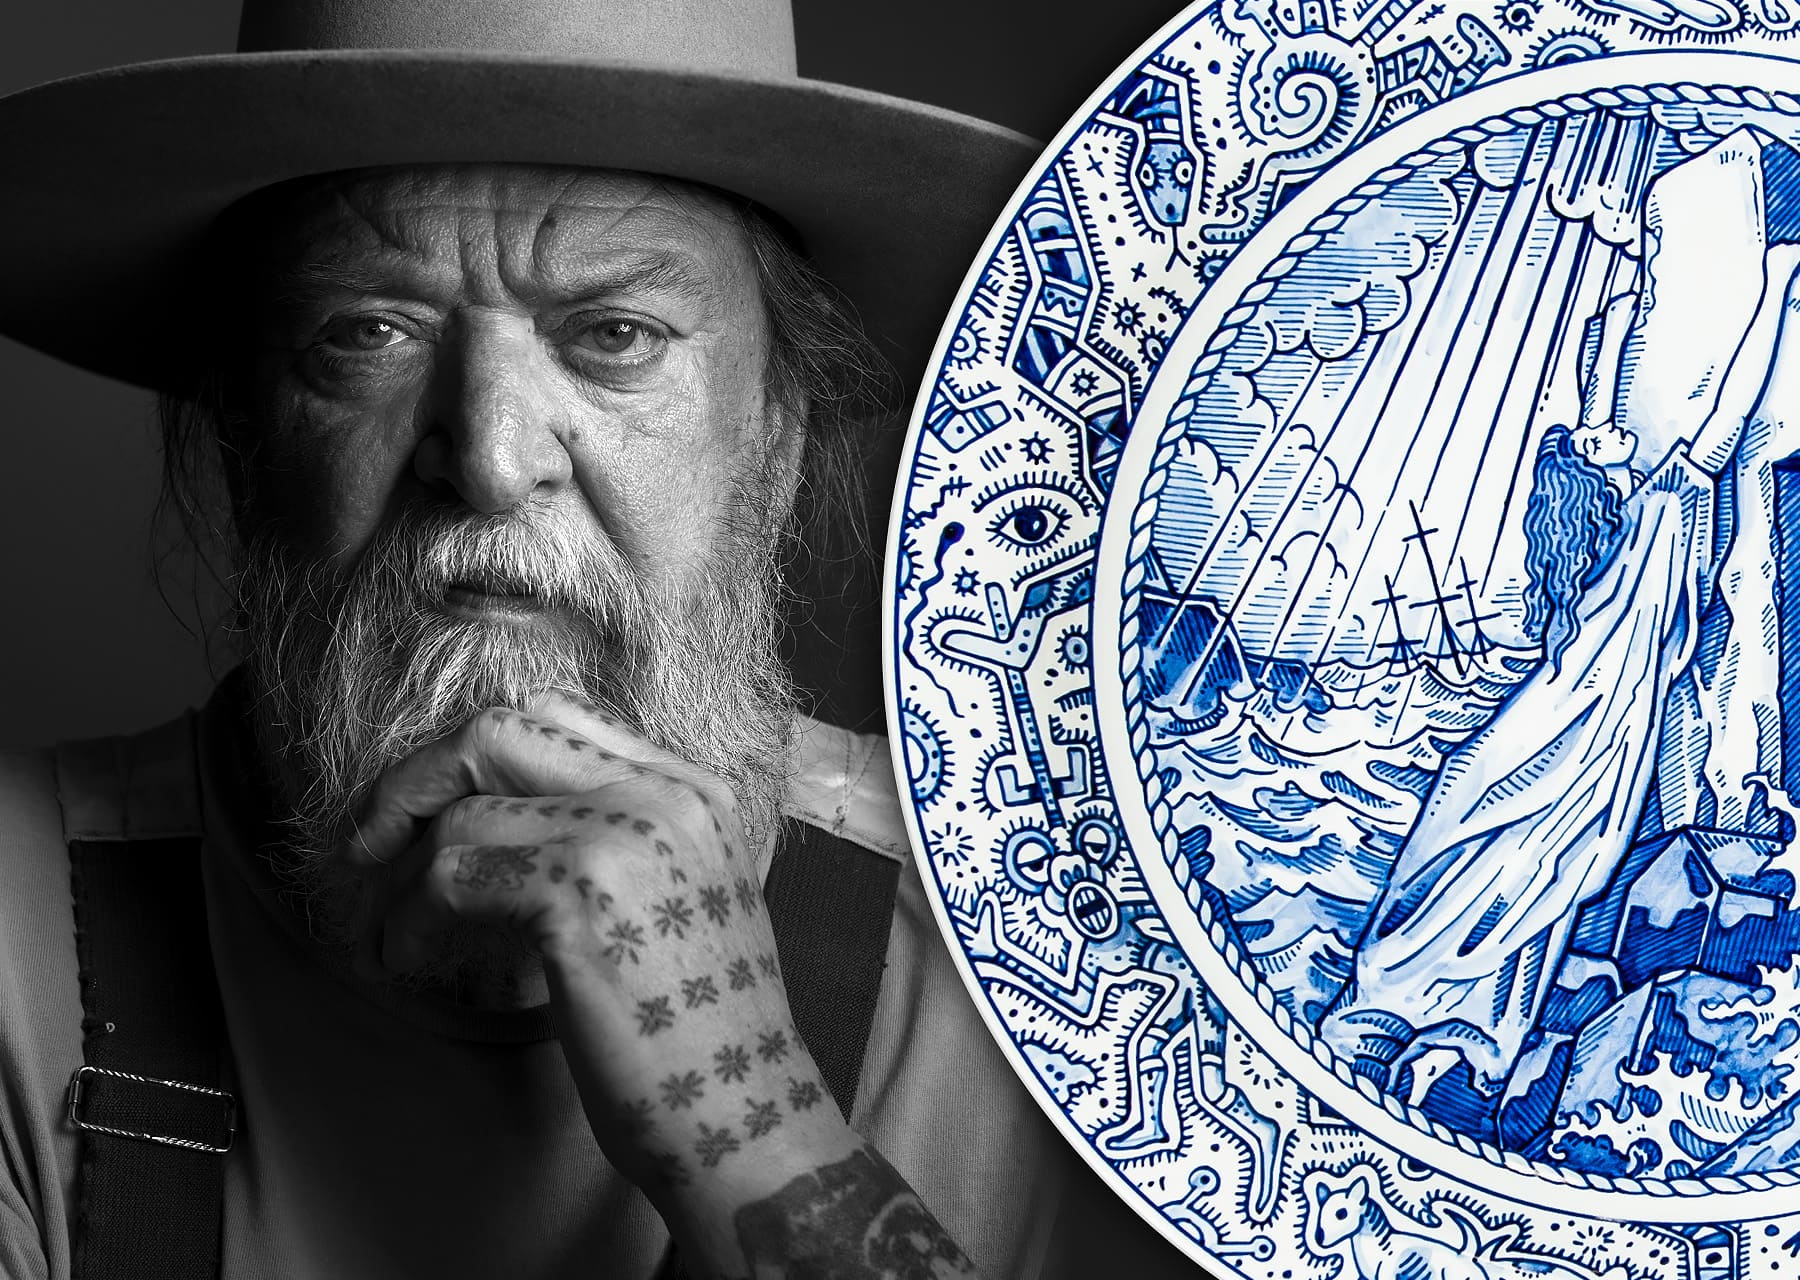 Schiffmacher Royal Blue Tattoo